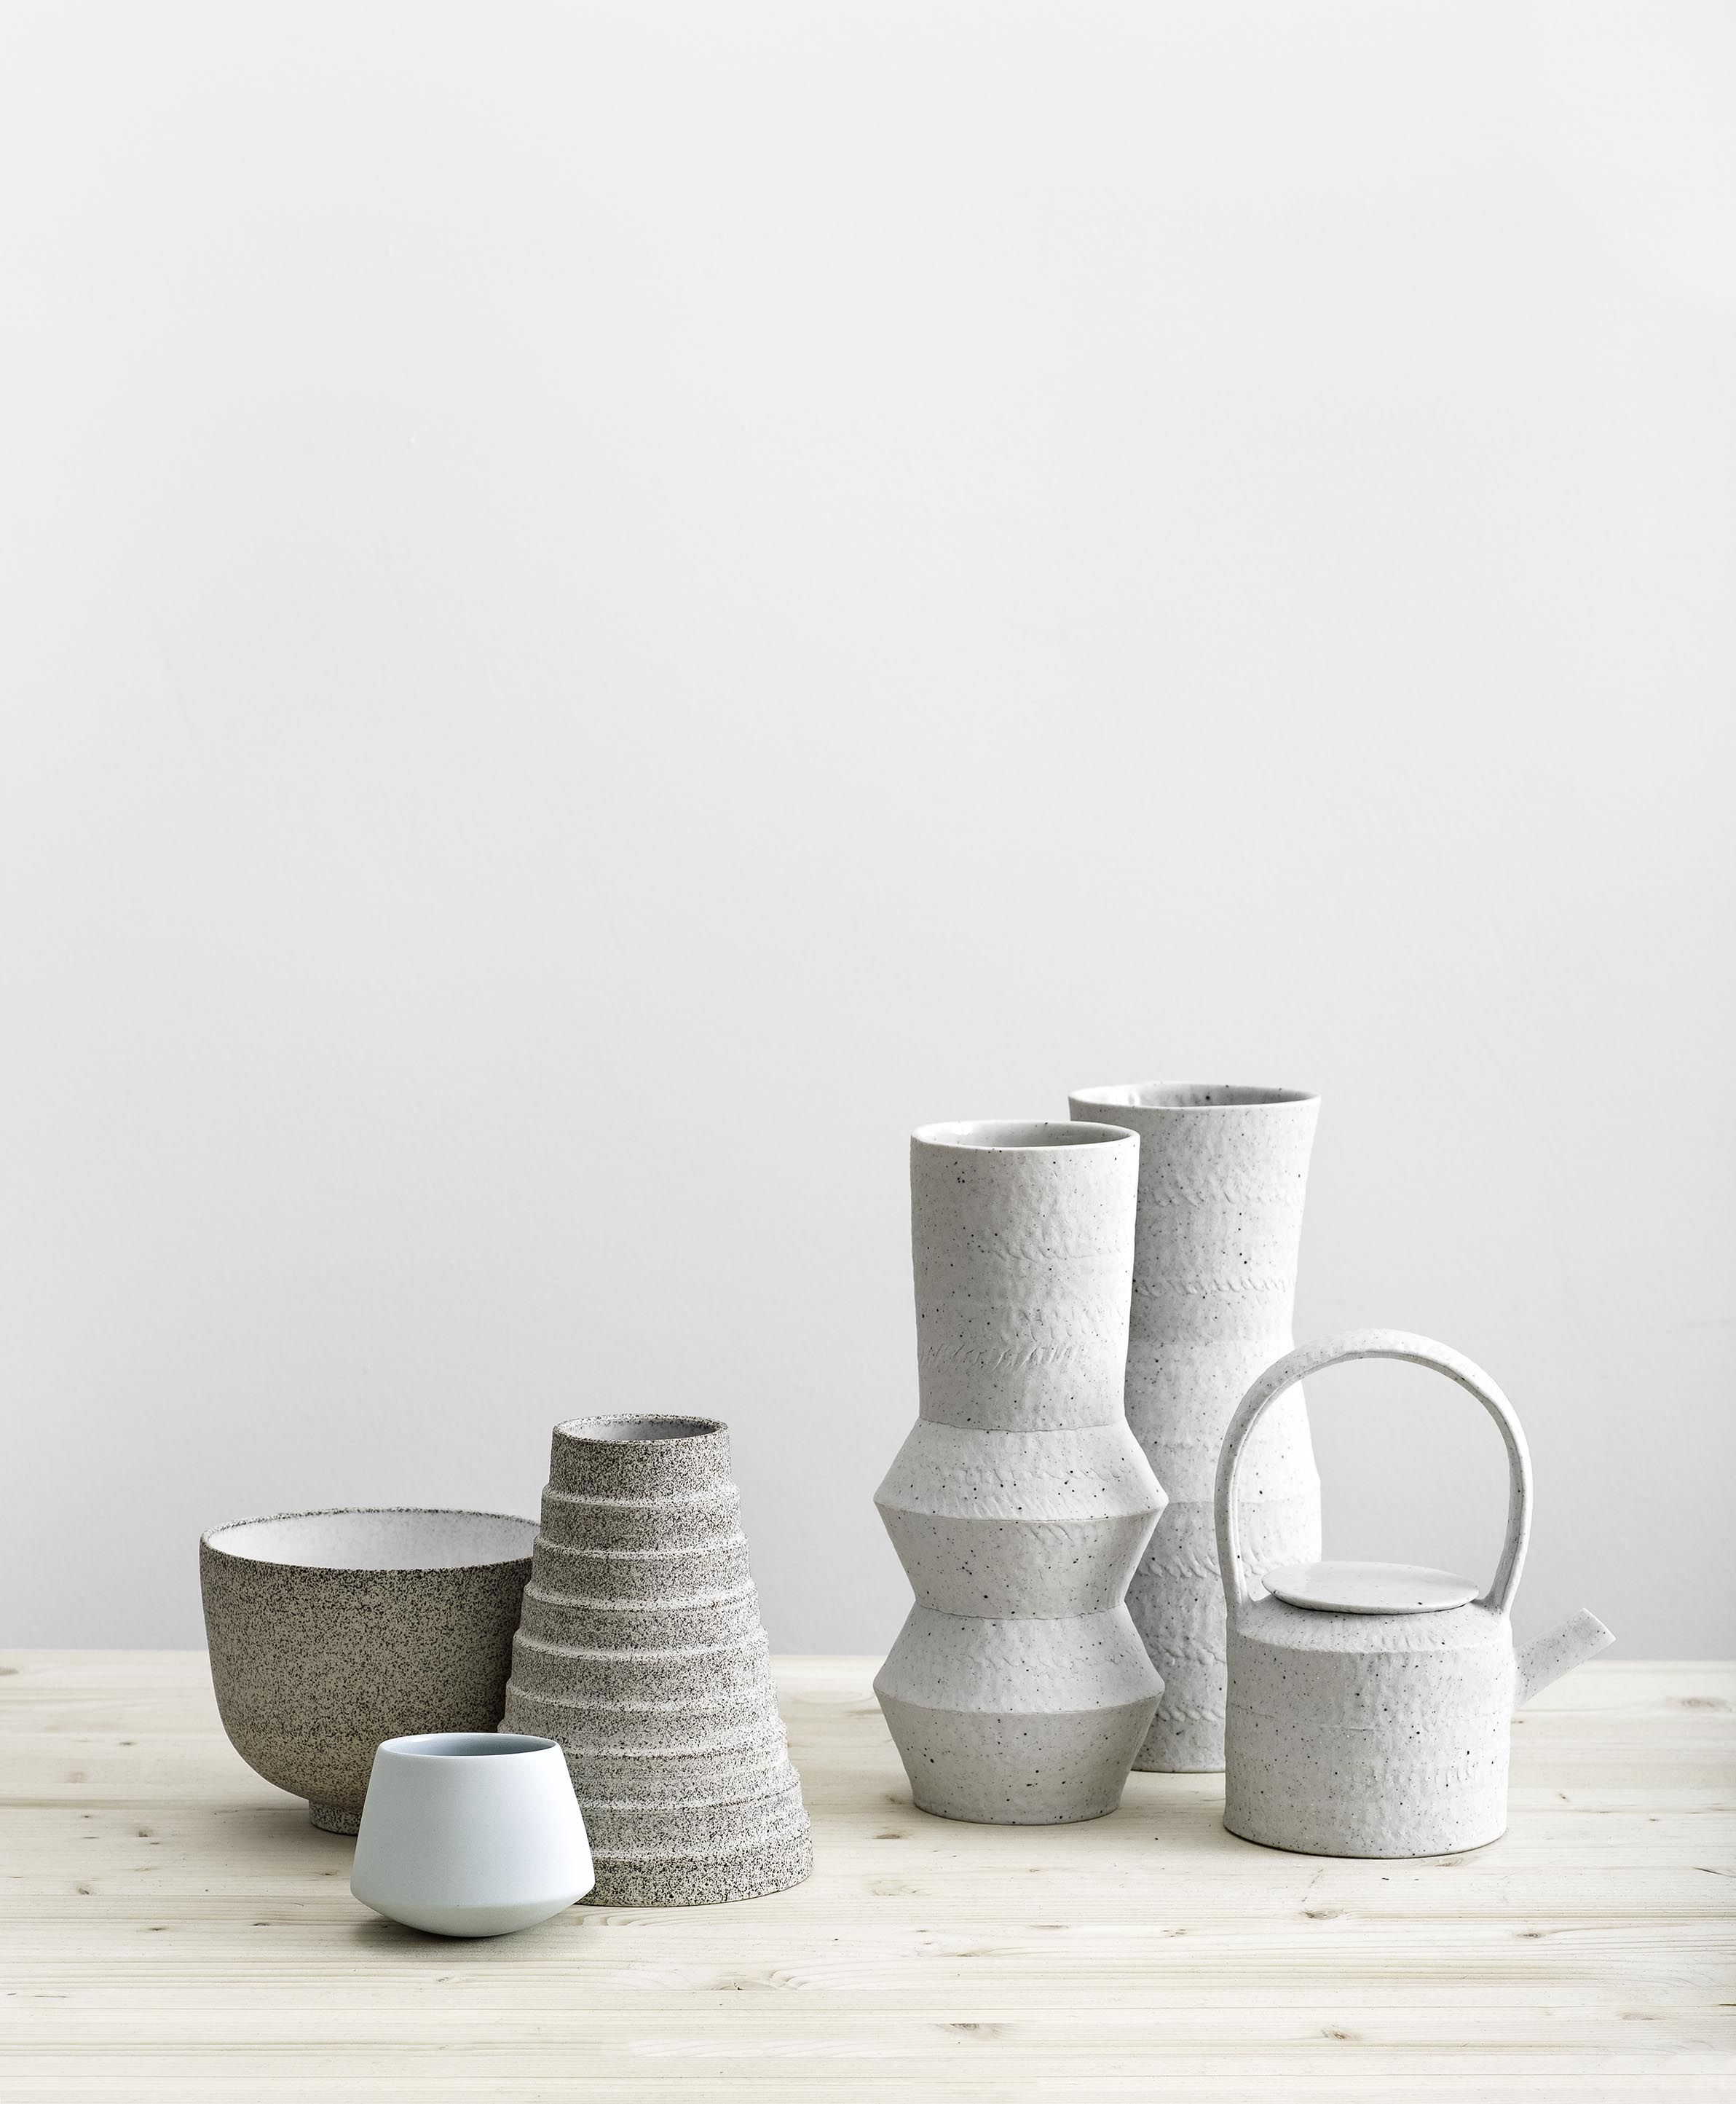 introducing bon ceramics | keramiken und transporter, Hause ideen